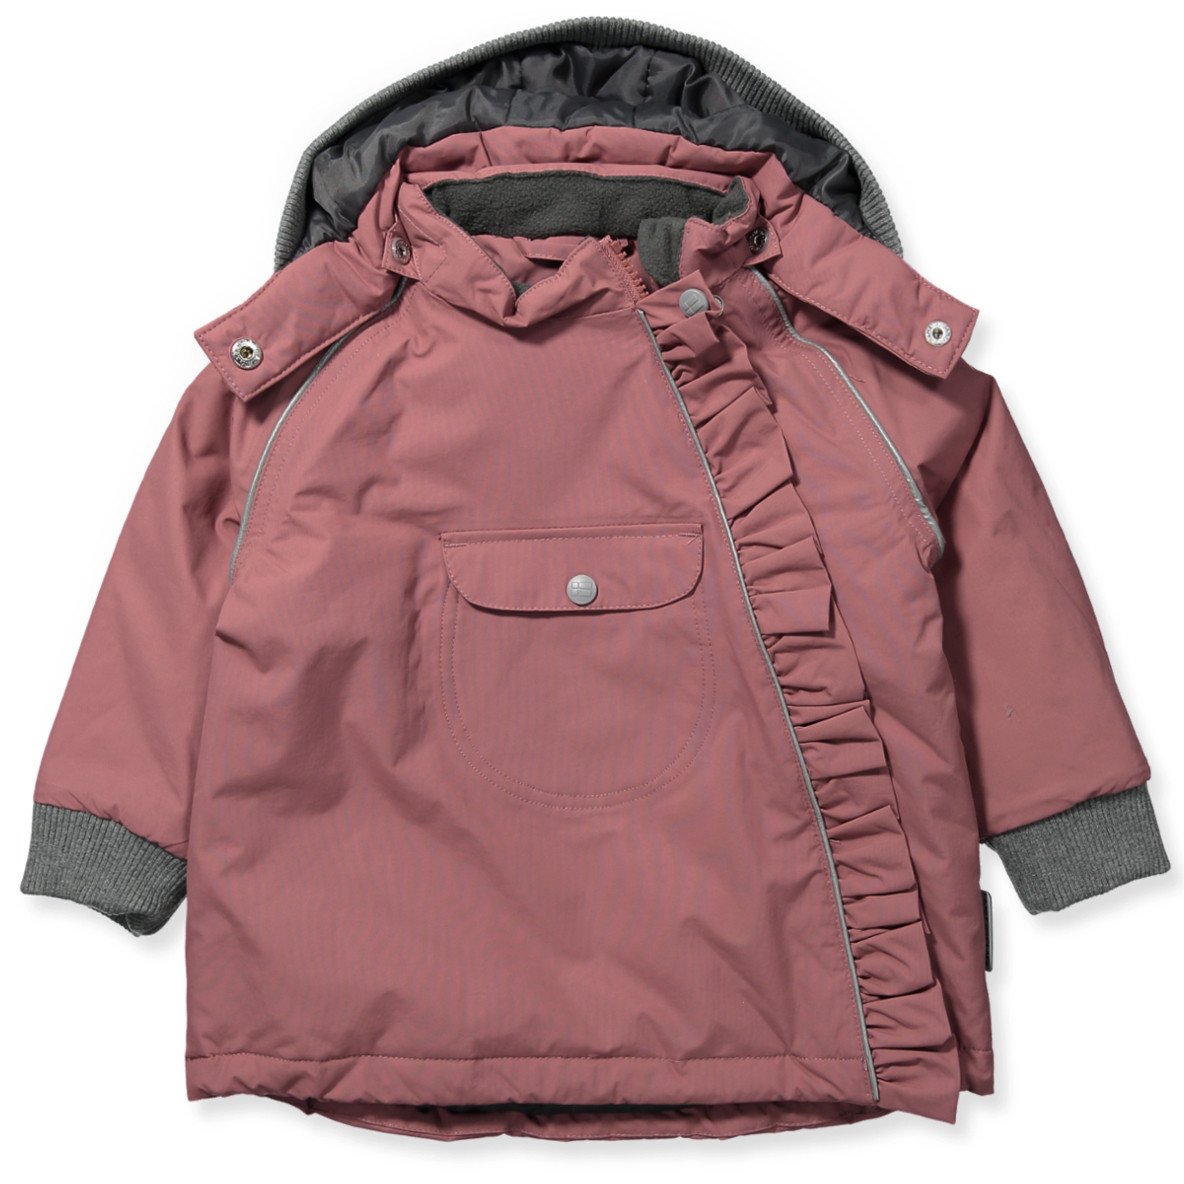 a061c6ddf5a Hust & Claire - Oby fashion vinterjakke - Deco rose